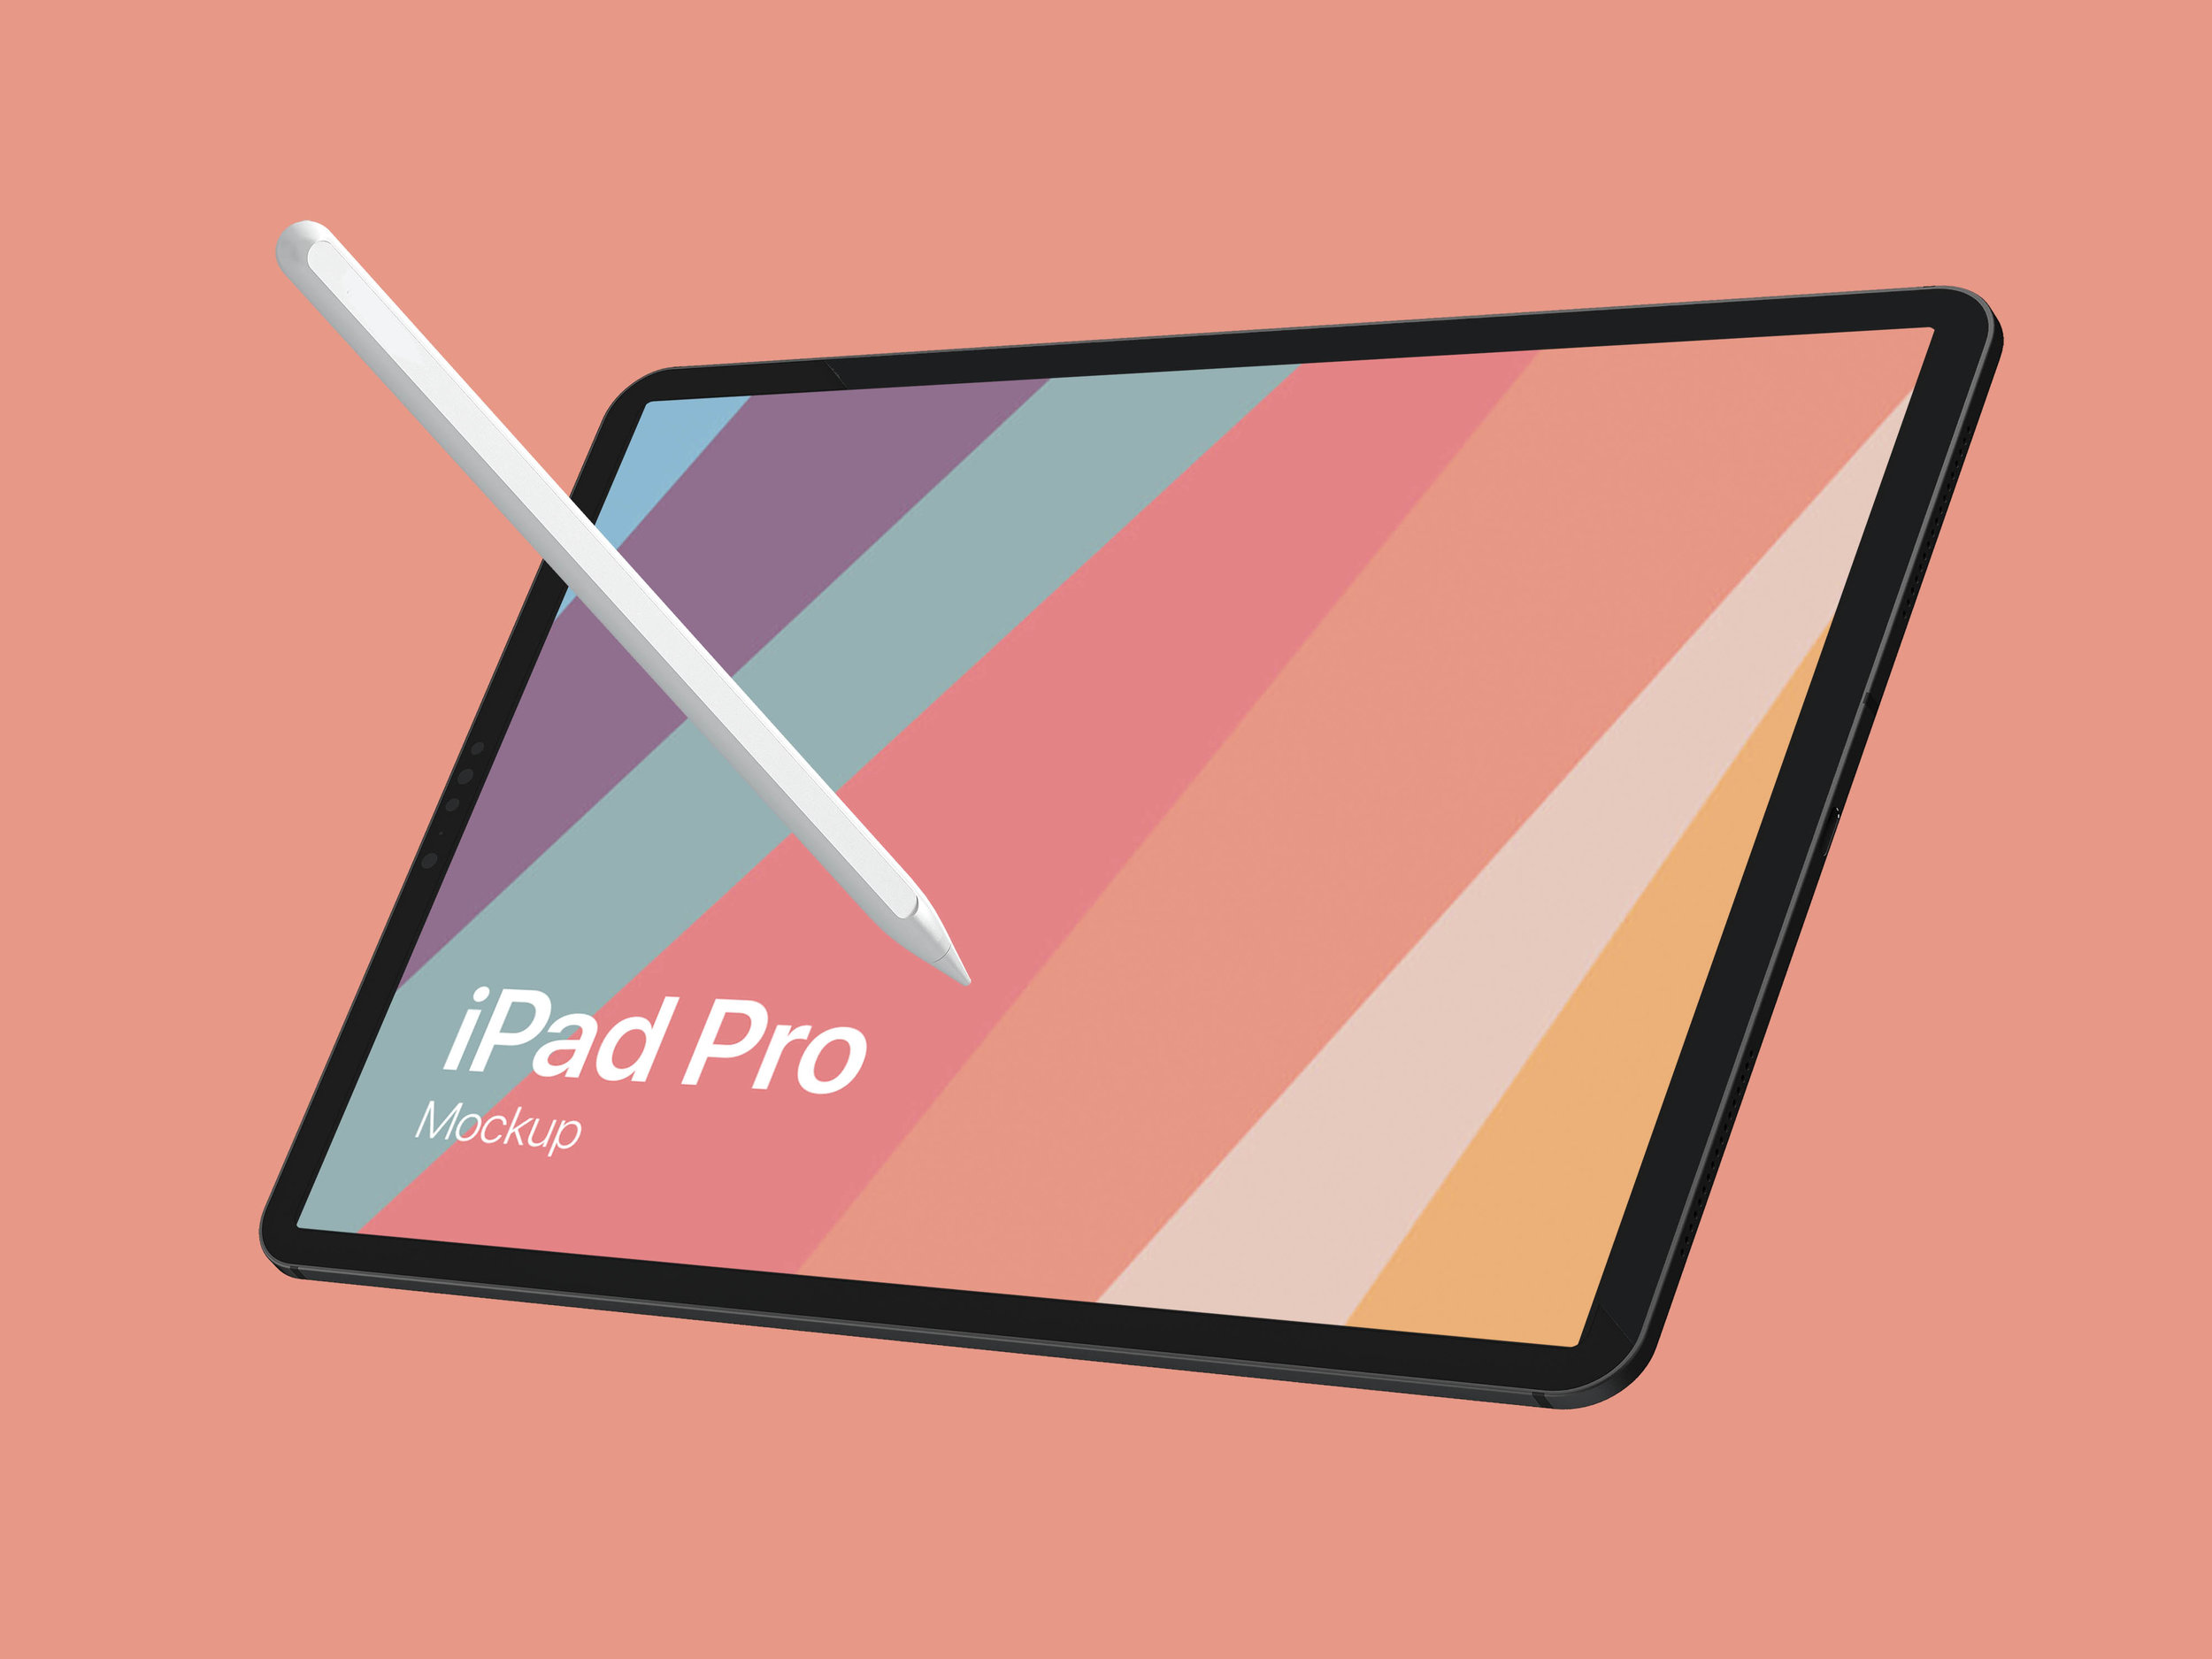 iPad Pro Design Mockup.jpg